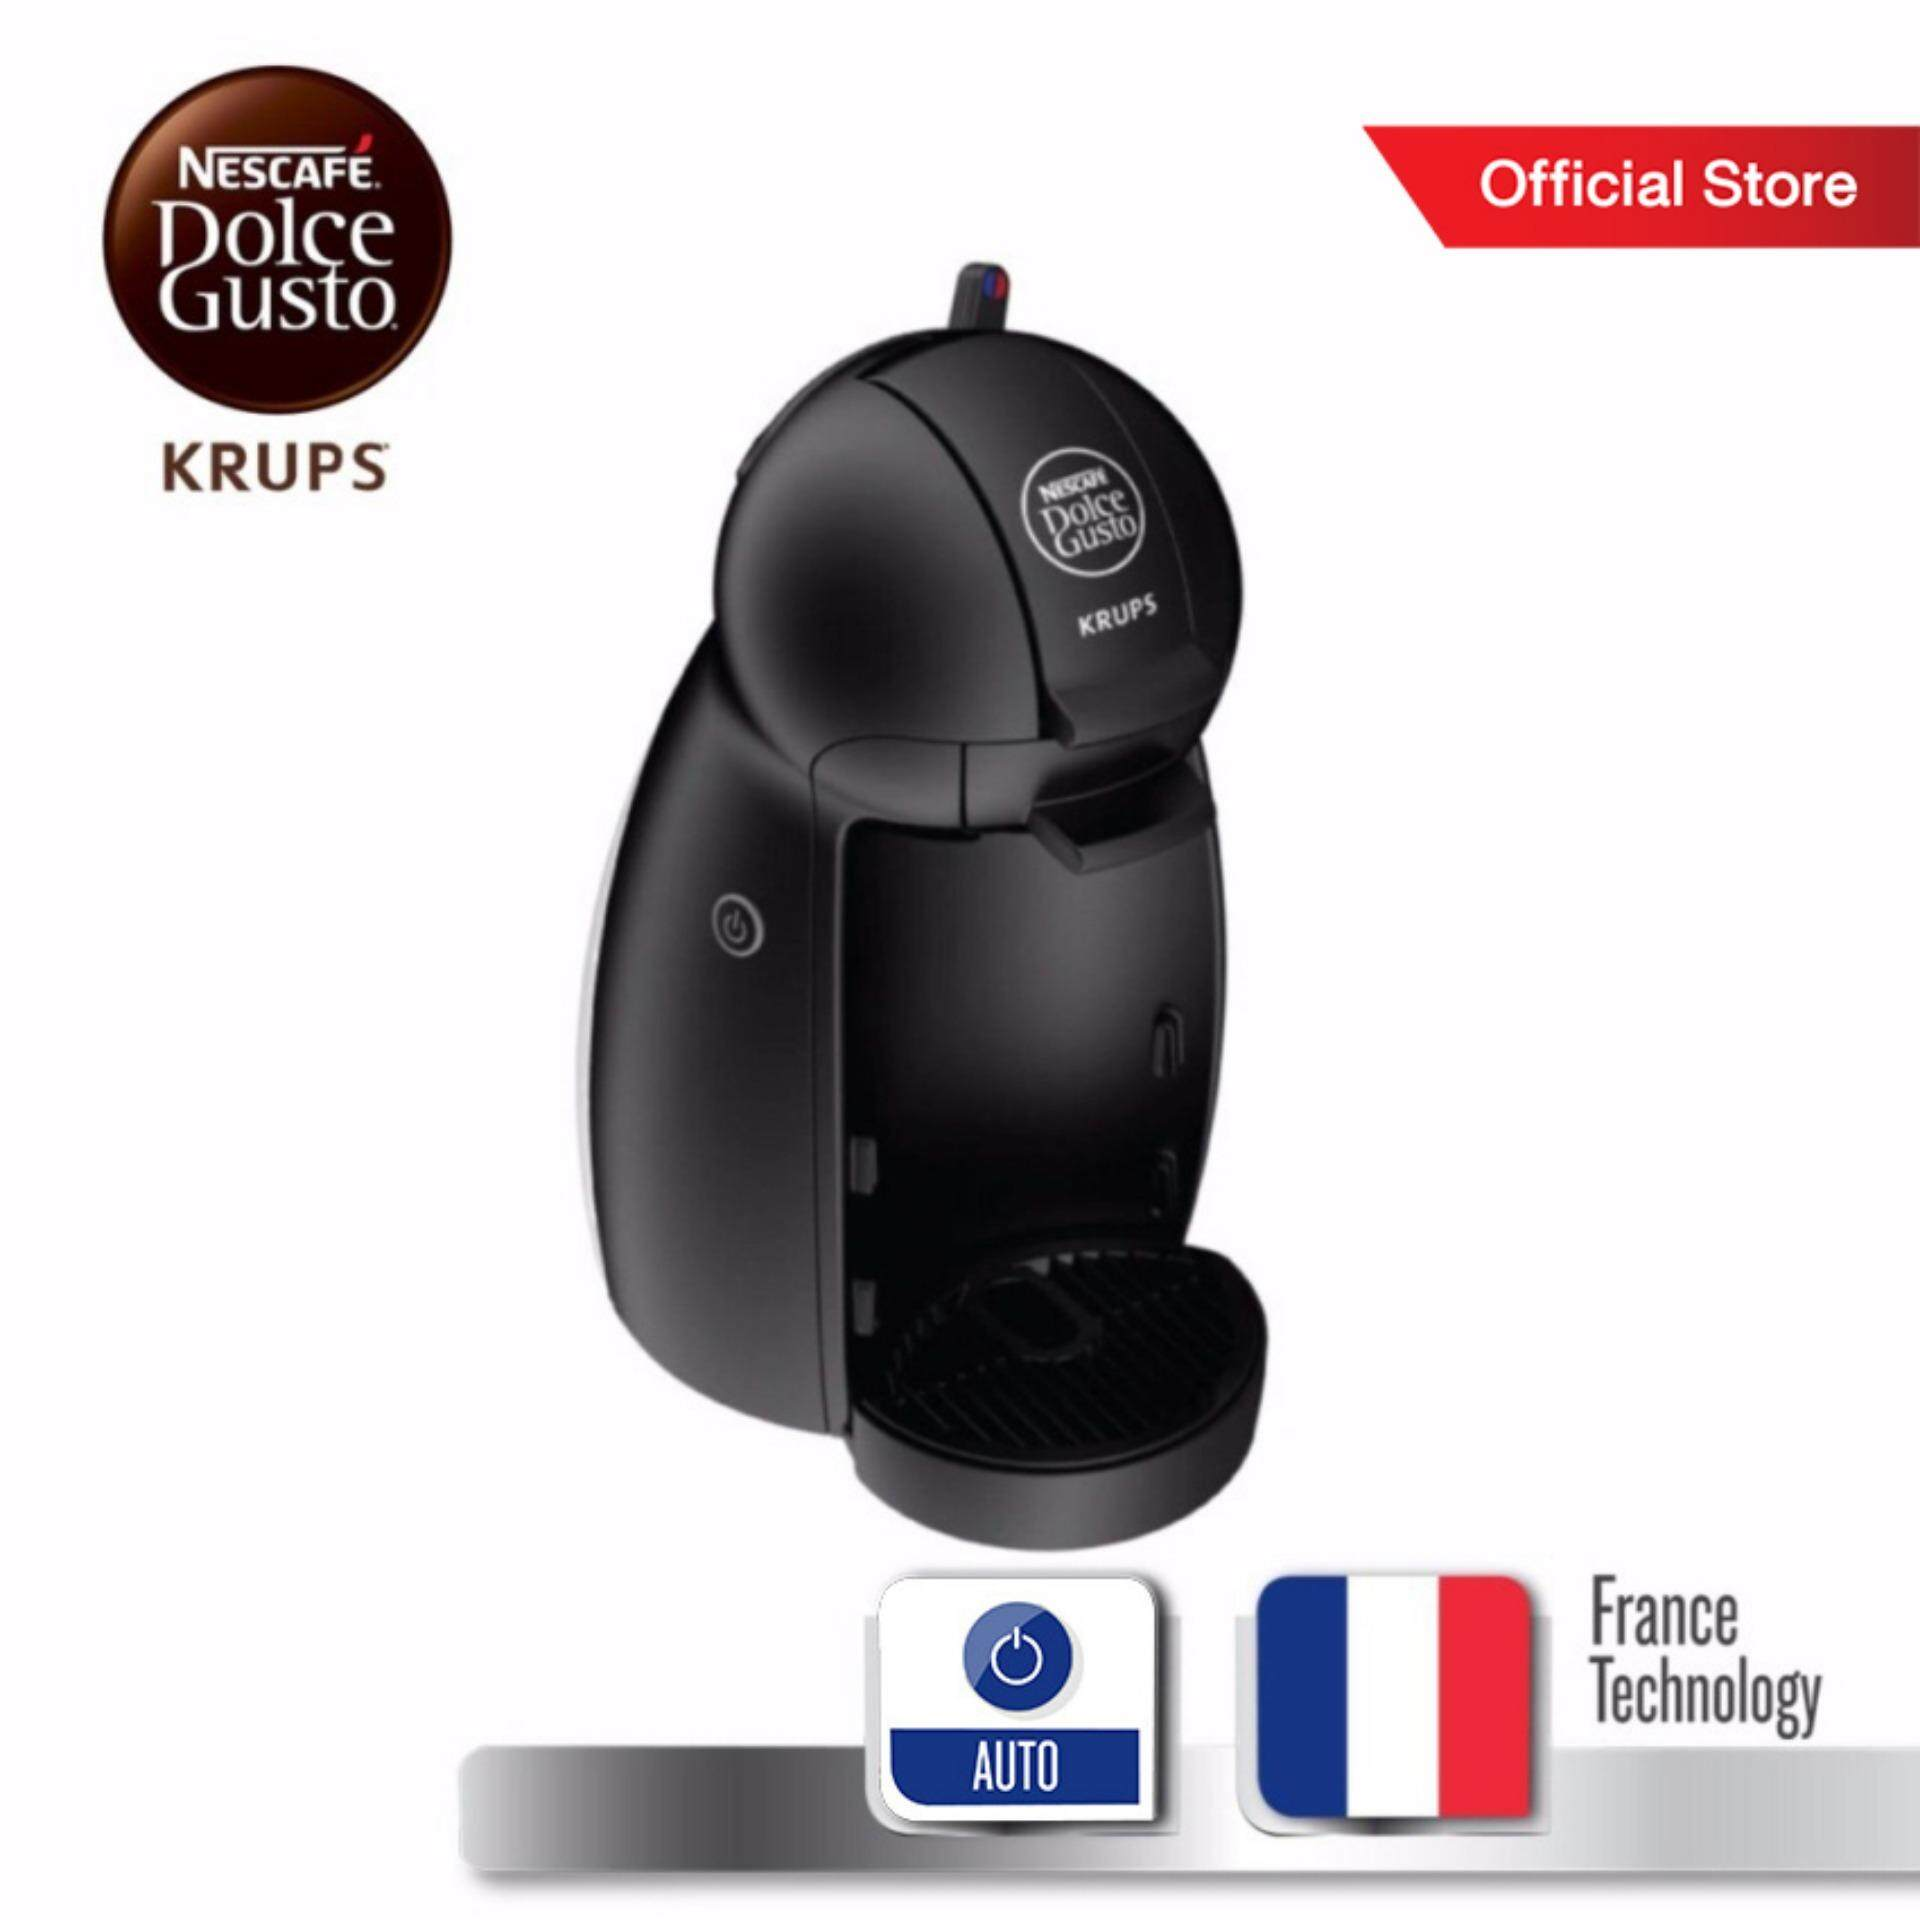 Nescafe Dolce Gusto (ndg) เครื่องทำกาแฟแคปซูล กำลังไฟ 1500 วัตต์ ความจุแท้งน้ำ 0.6 ลิตร รุ่น Piccolo Kp100b66 -Black By Tefal Official Store.